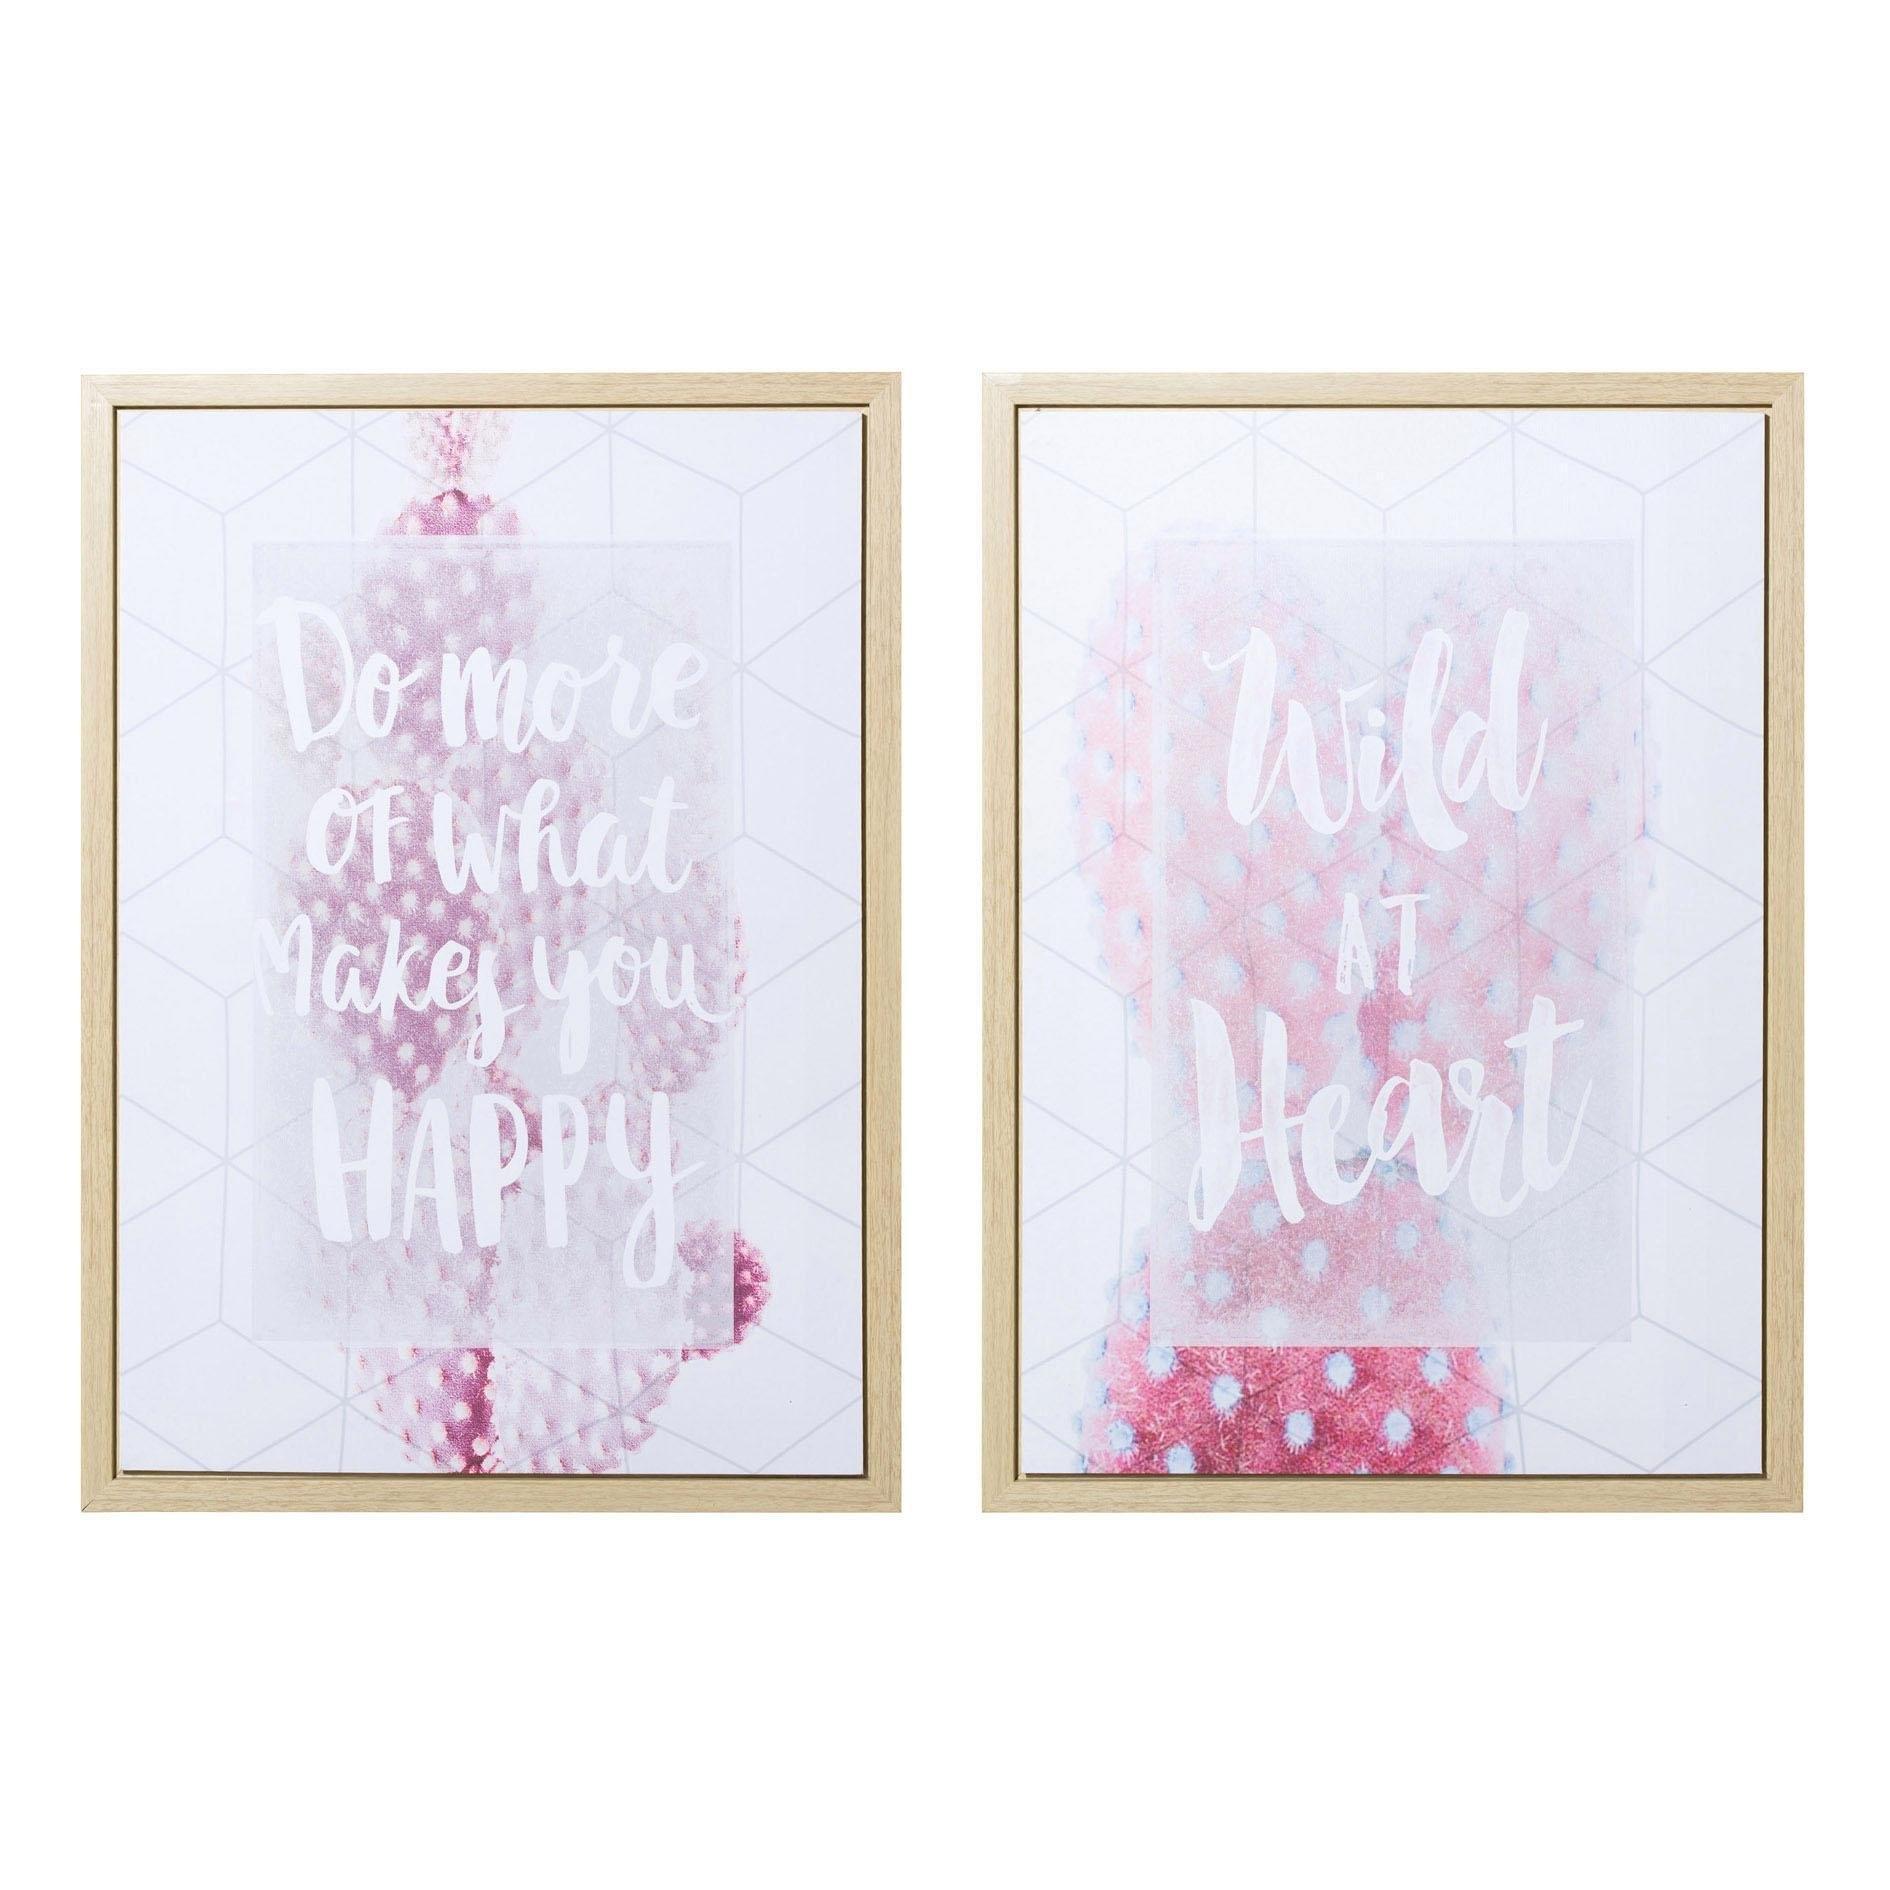 Creativ home artprint op linnen nu online kopen bij OTTO